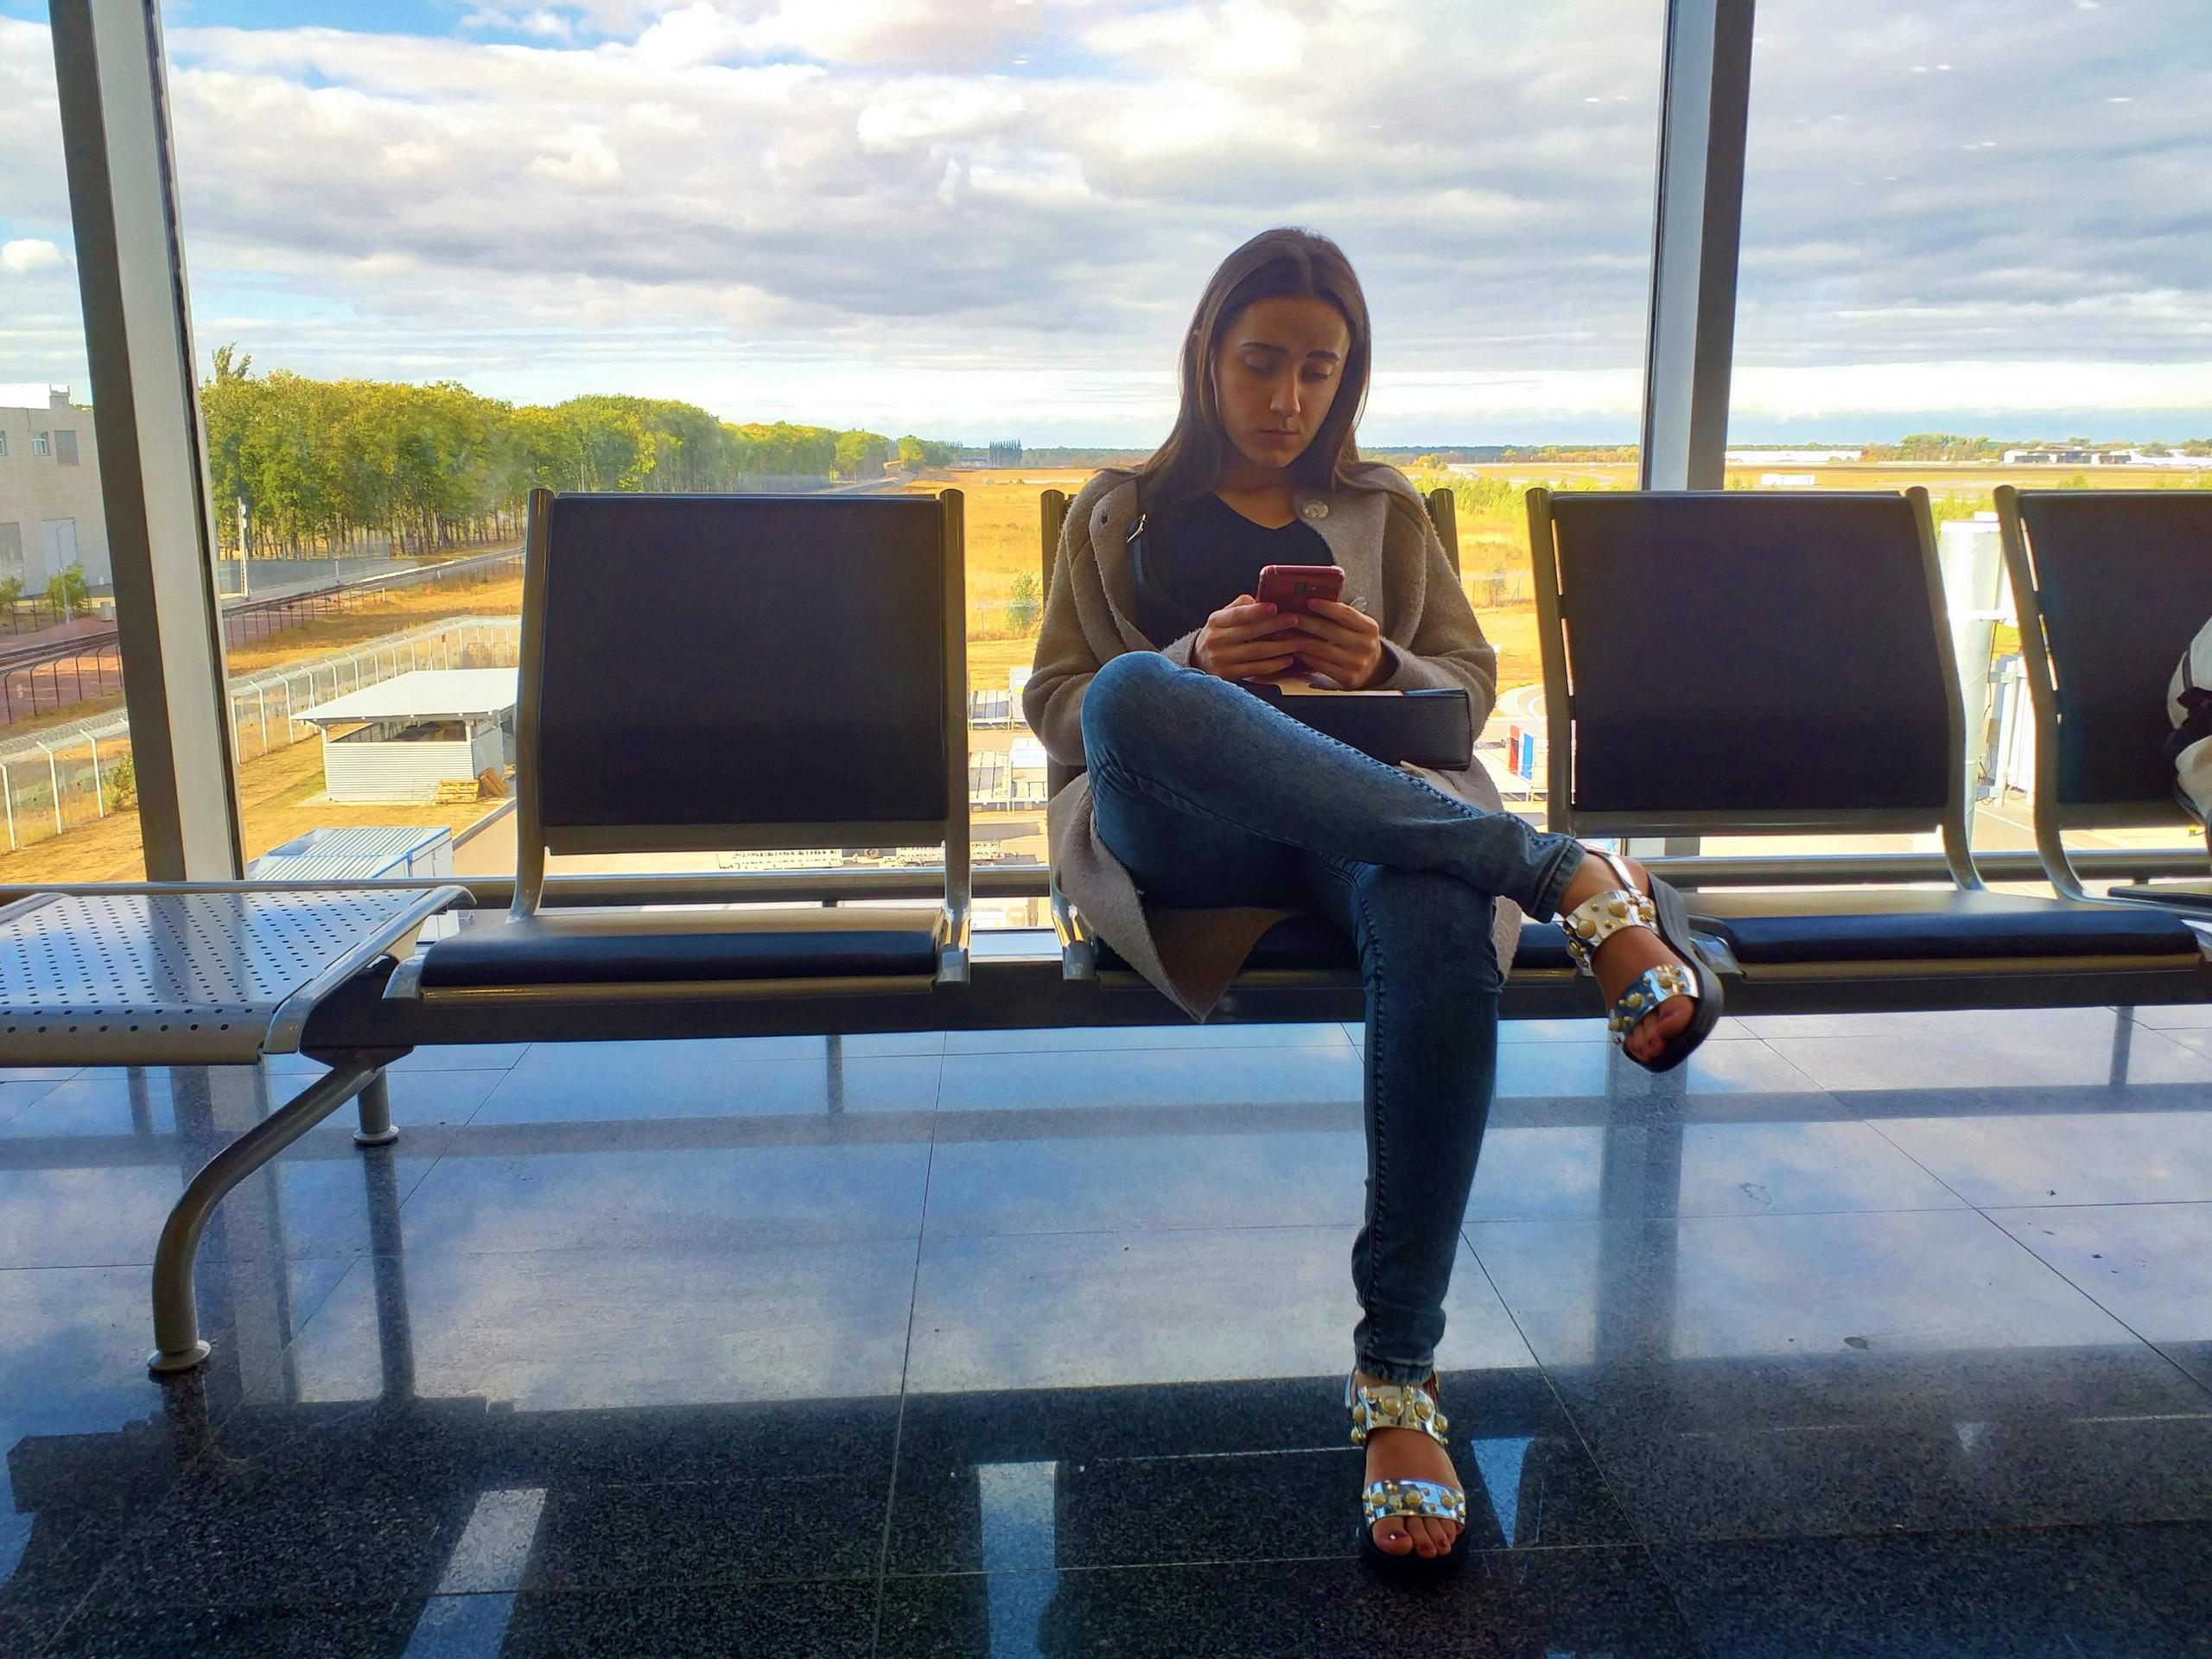 Елена Руденко (Валтея). Мои путешествия. Таиланд ( 2019 г. осень) ФОТО. IL-3VqxH0WI